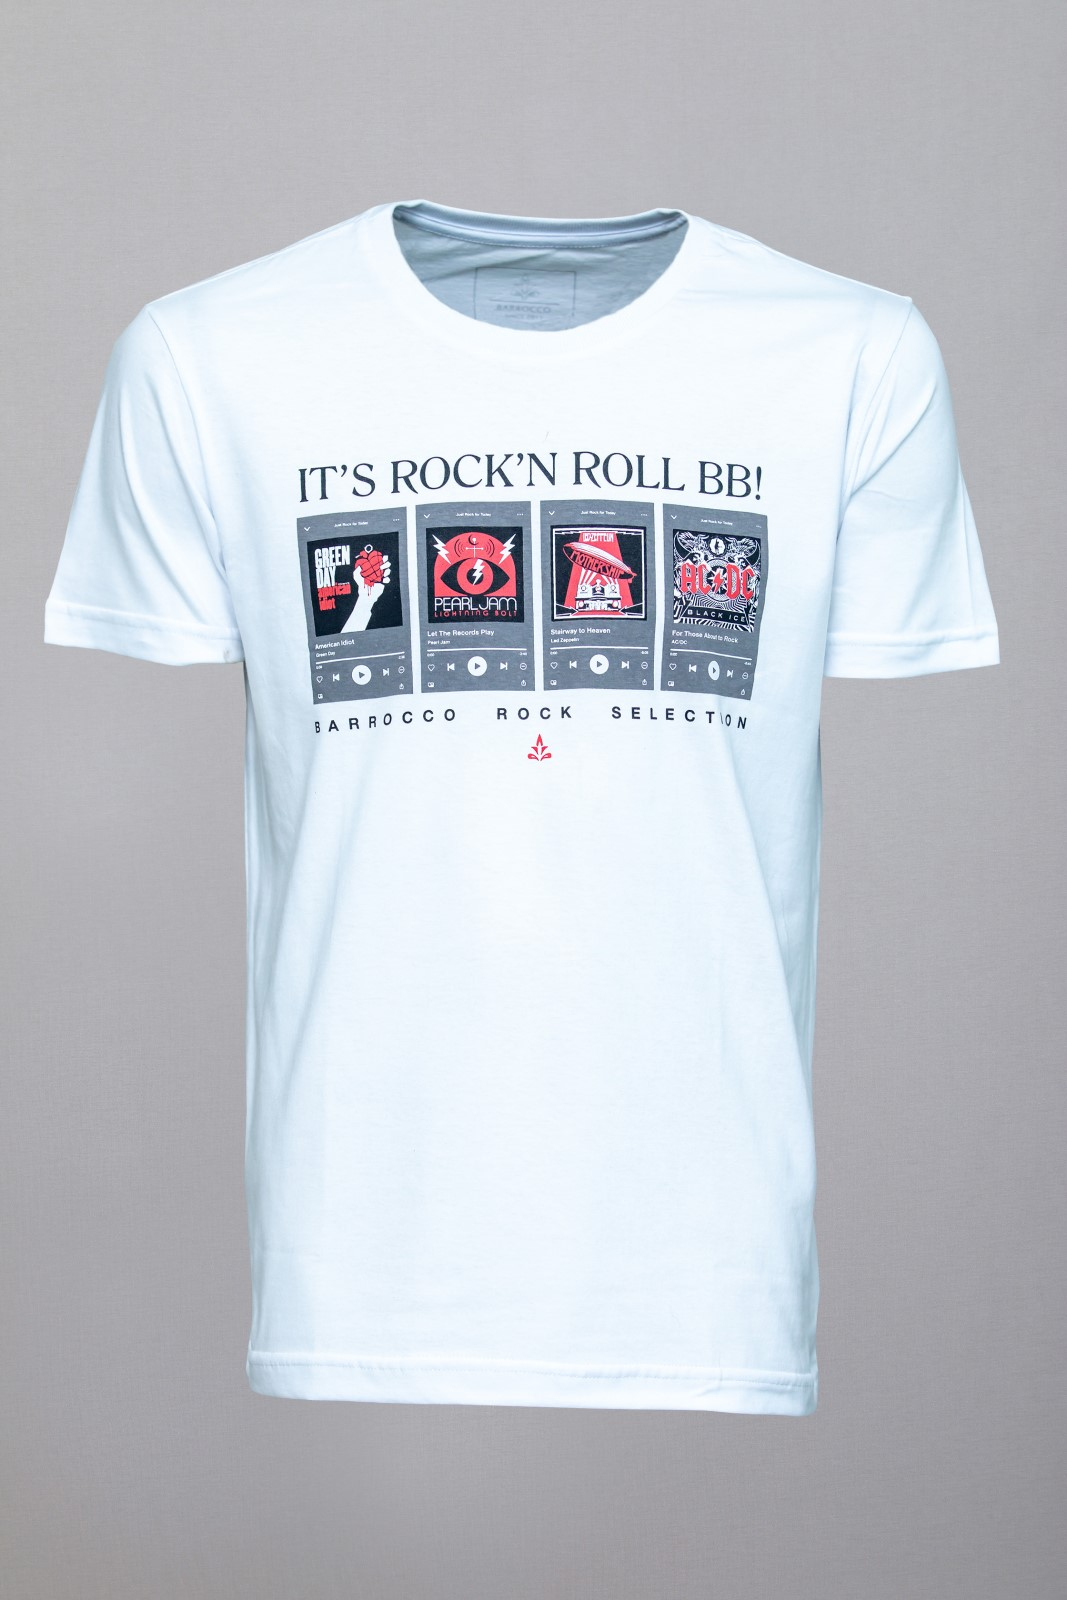 Camiseta Barrocco Isso é Rock'n Roll, BB!